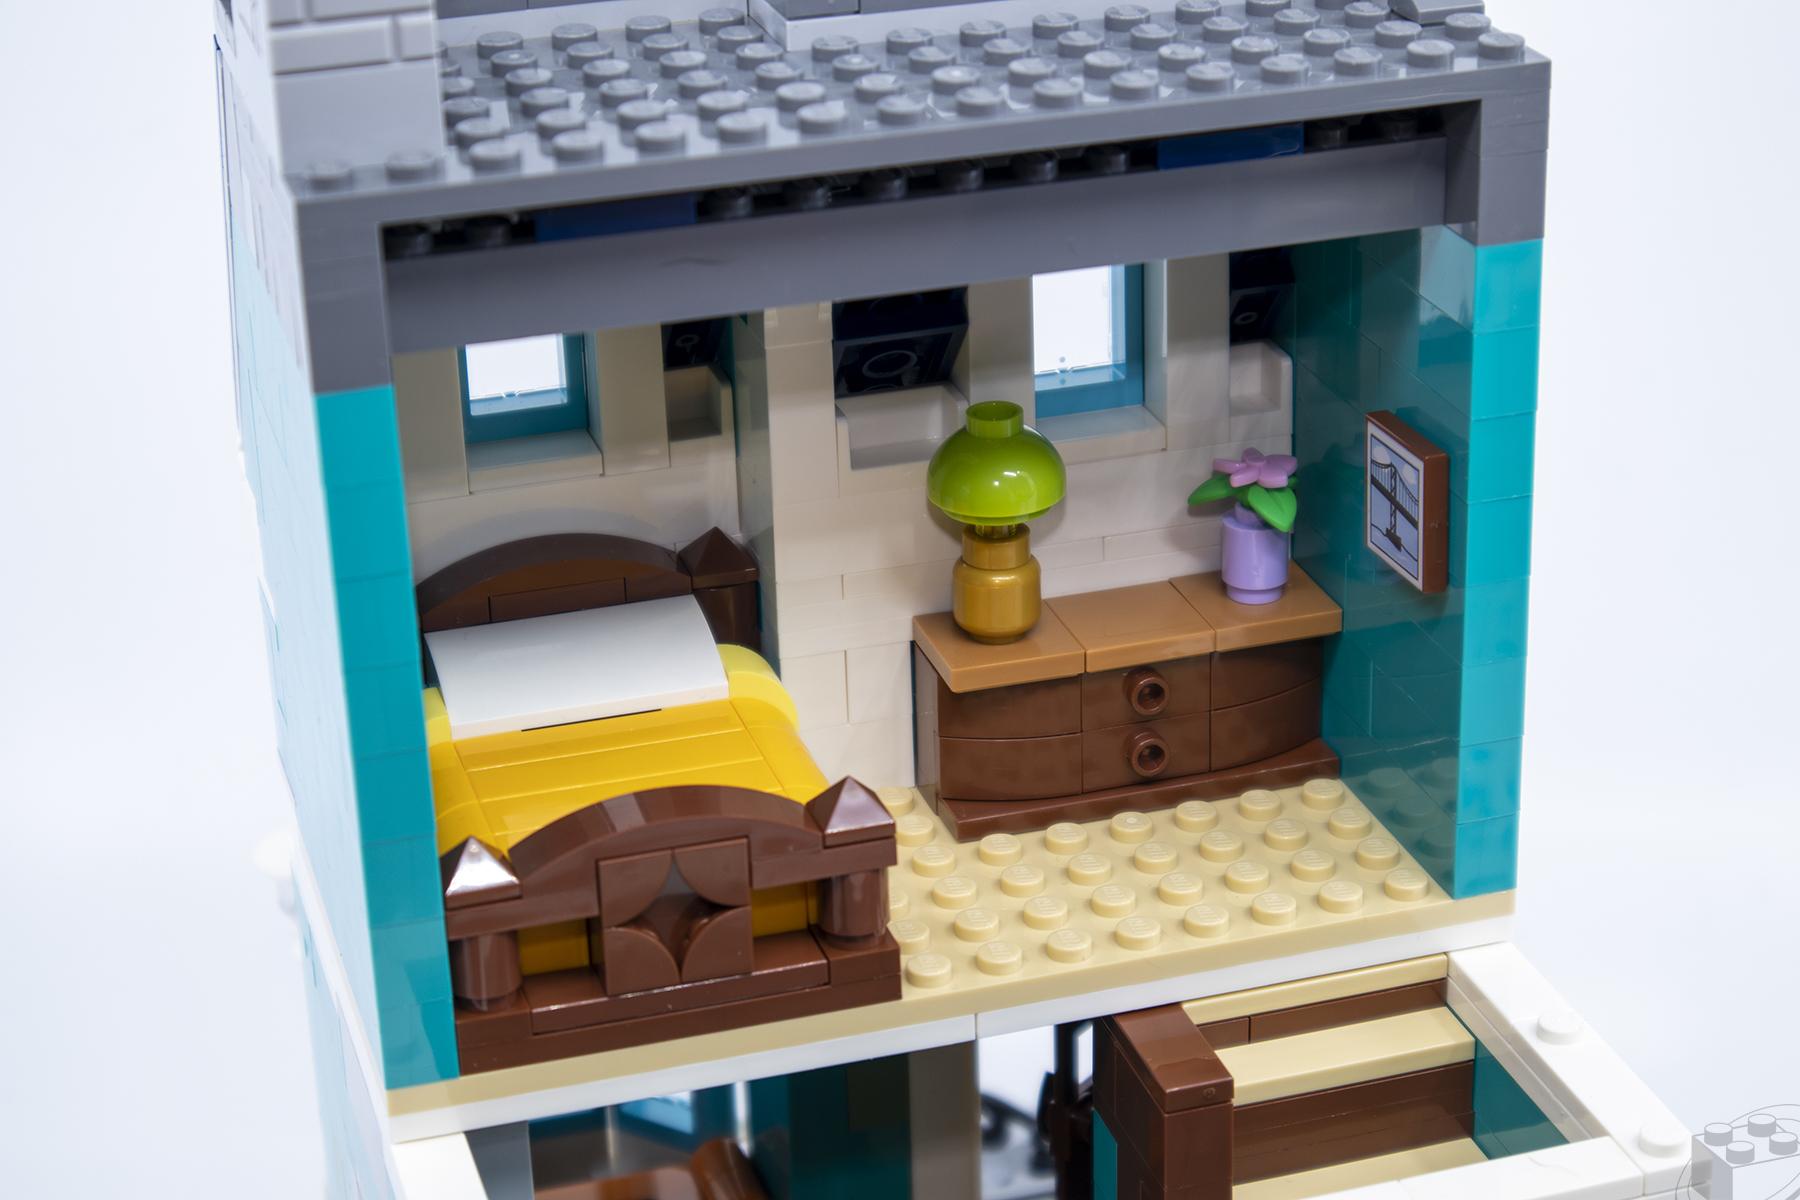 lego-bookshop-28